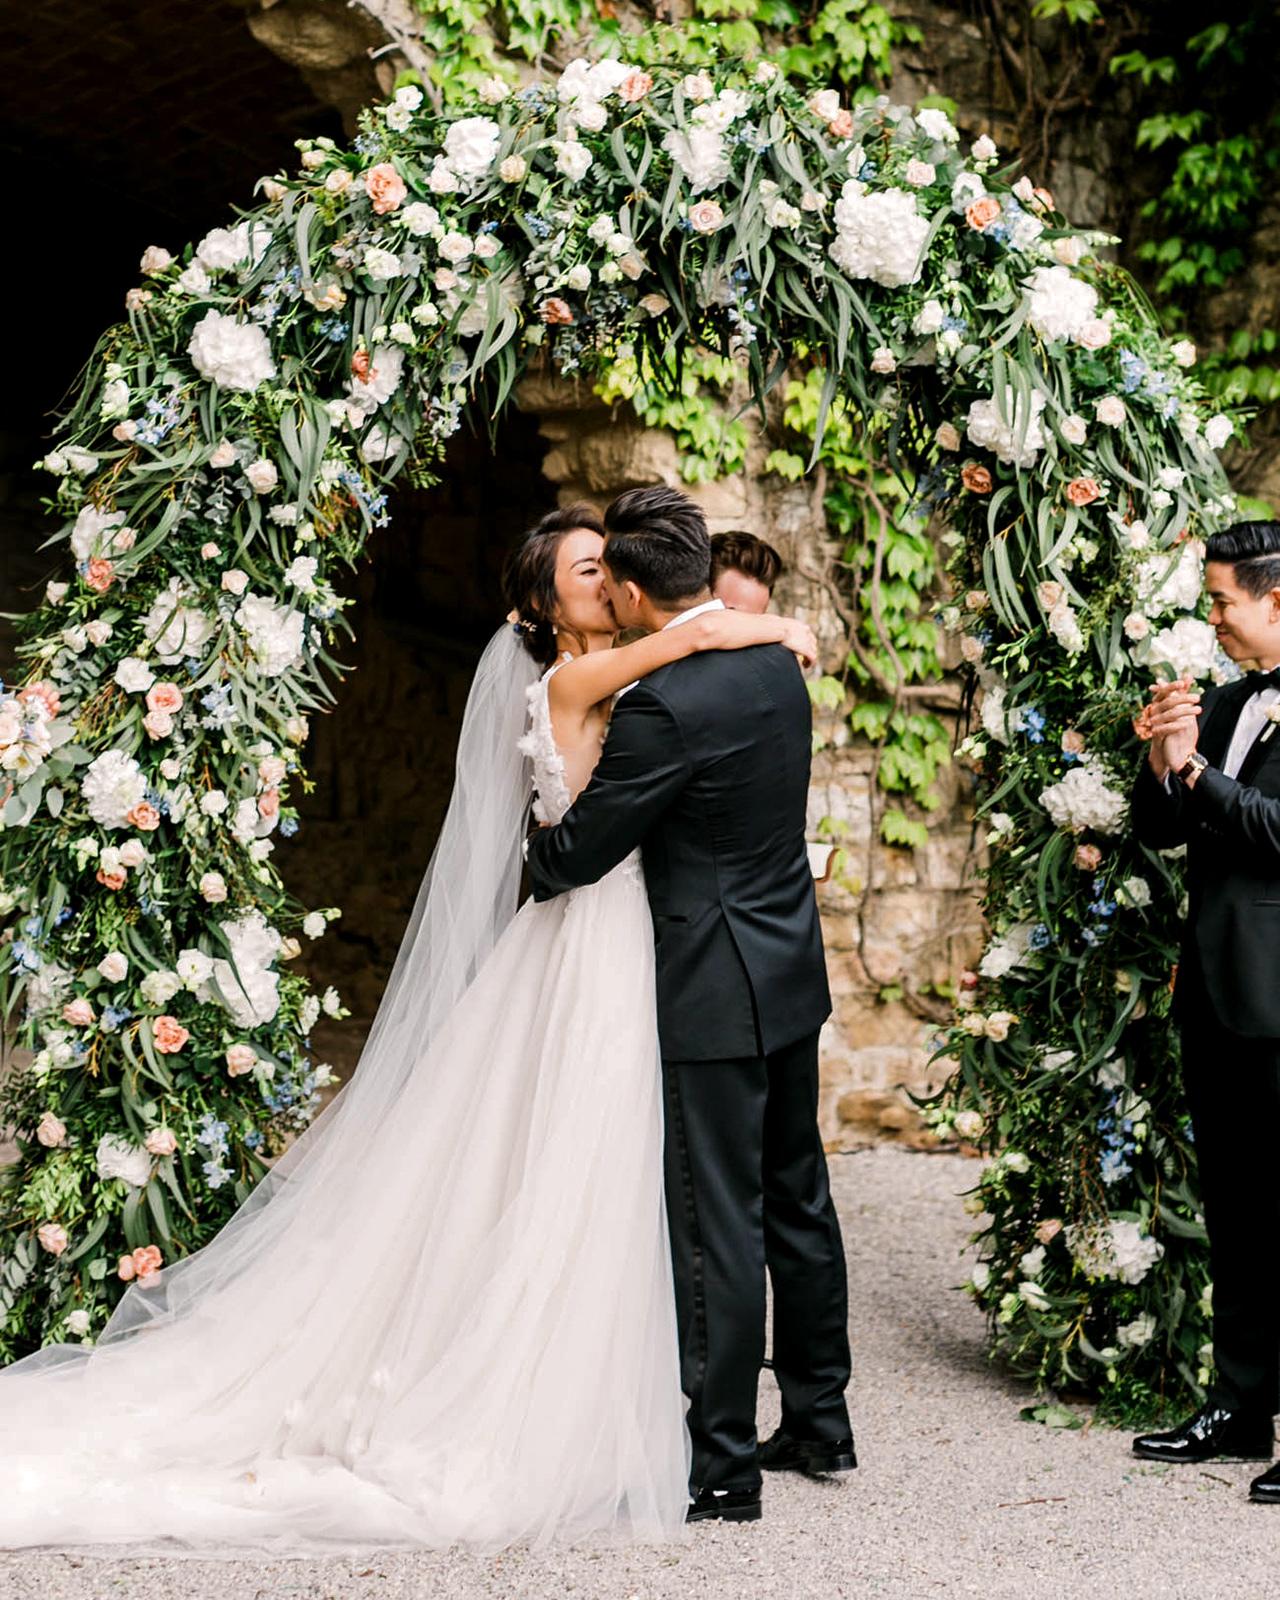 wedding reception kiss under floral arch